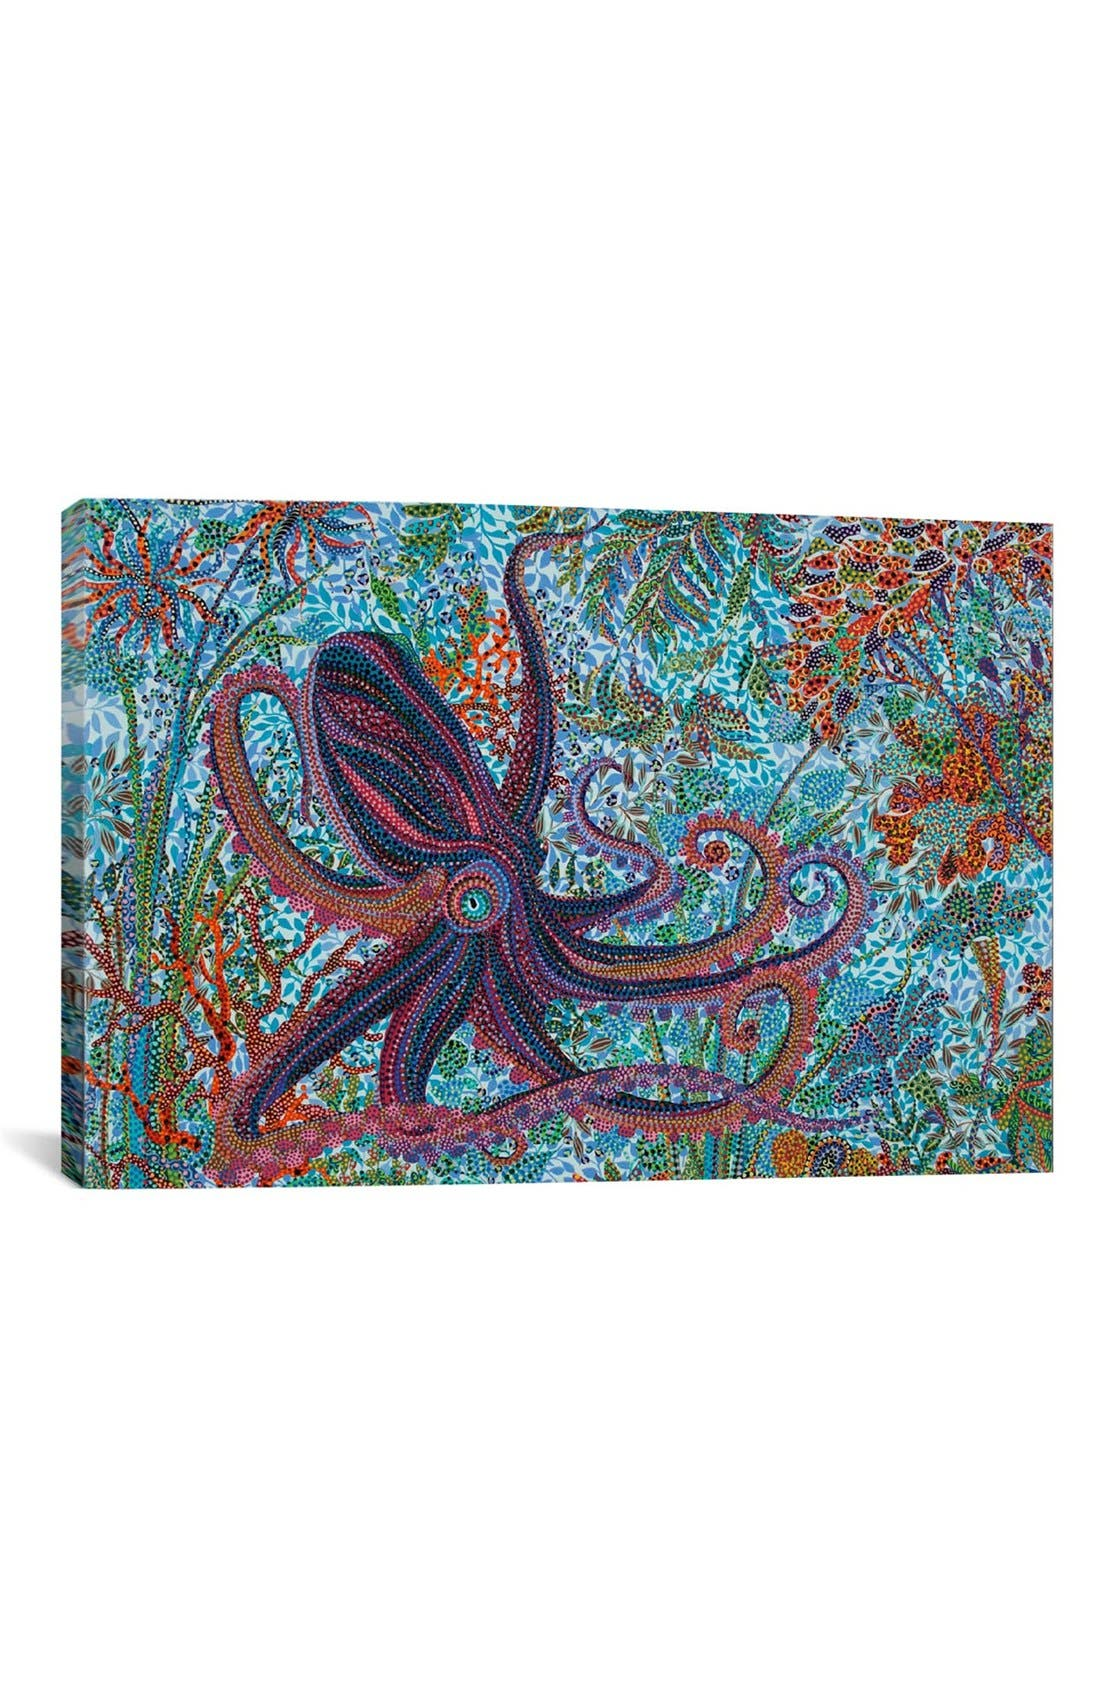 'Octopus - Ebova' Giclée Print Canvas Art,                         Main,                         color, 400